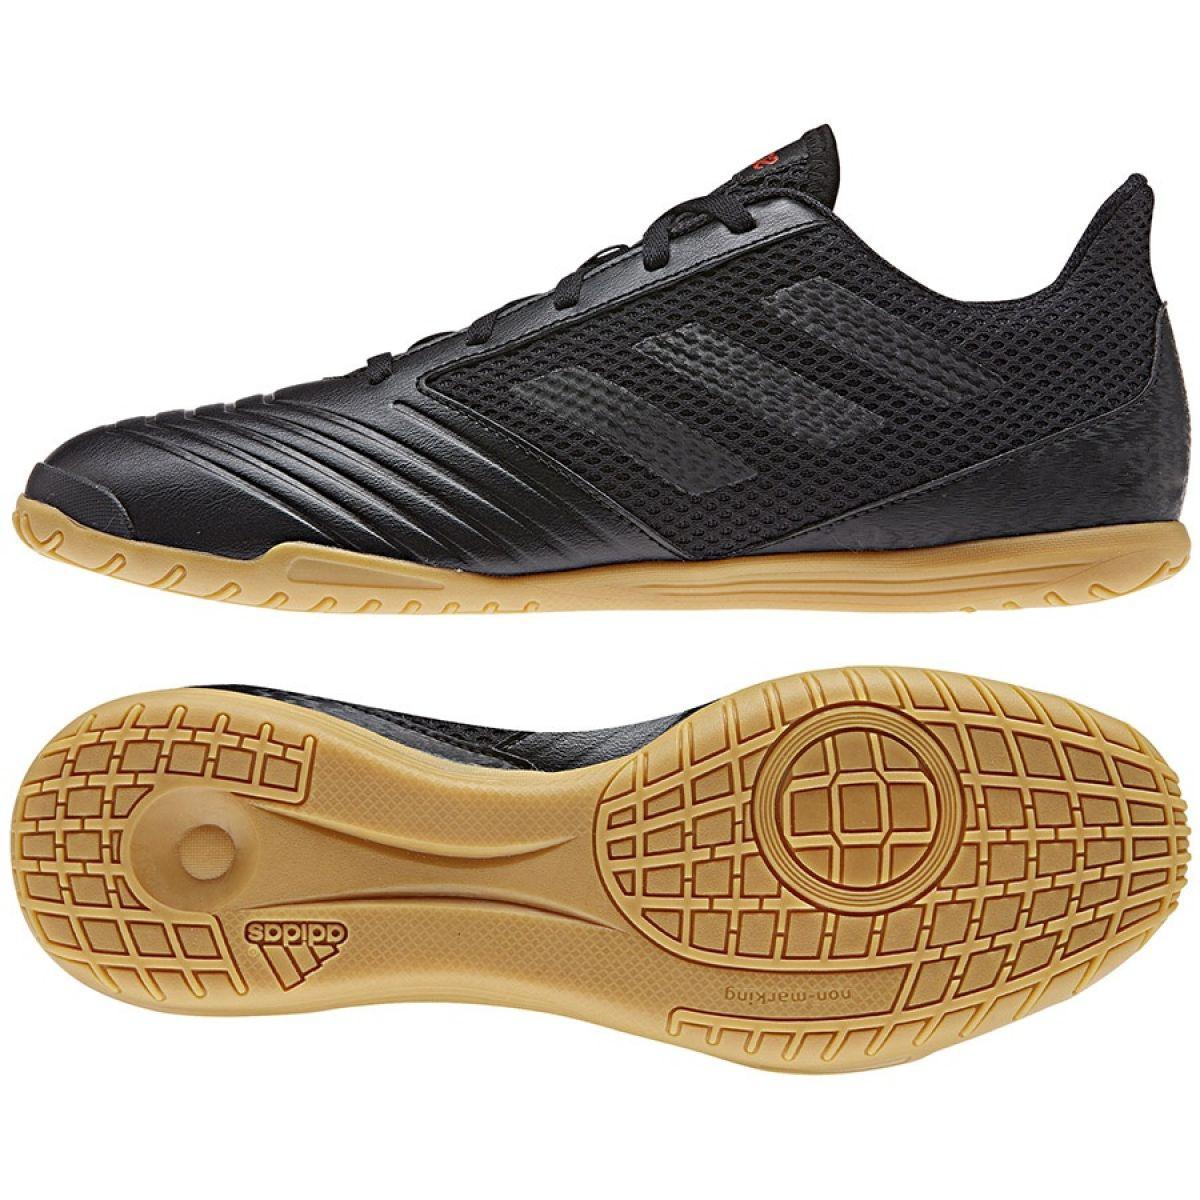 Inomhusskor adidas Predator 19.4 I Sala M D97975 svart svart